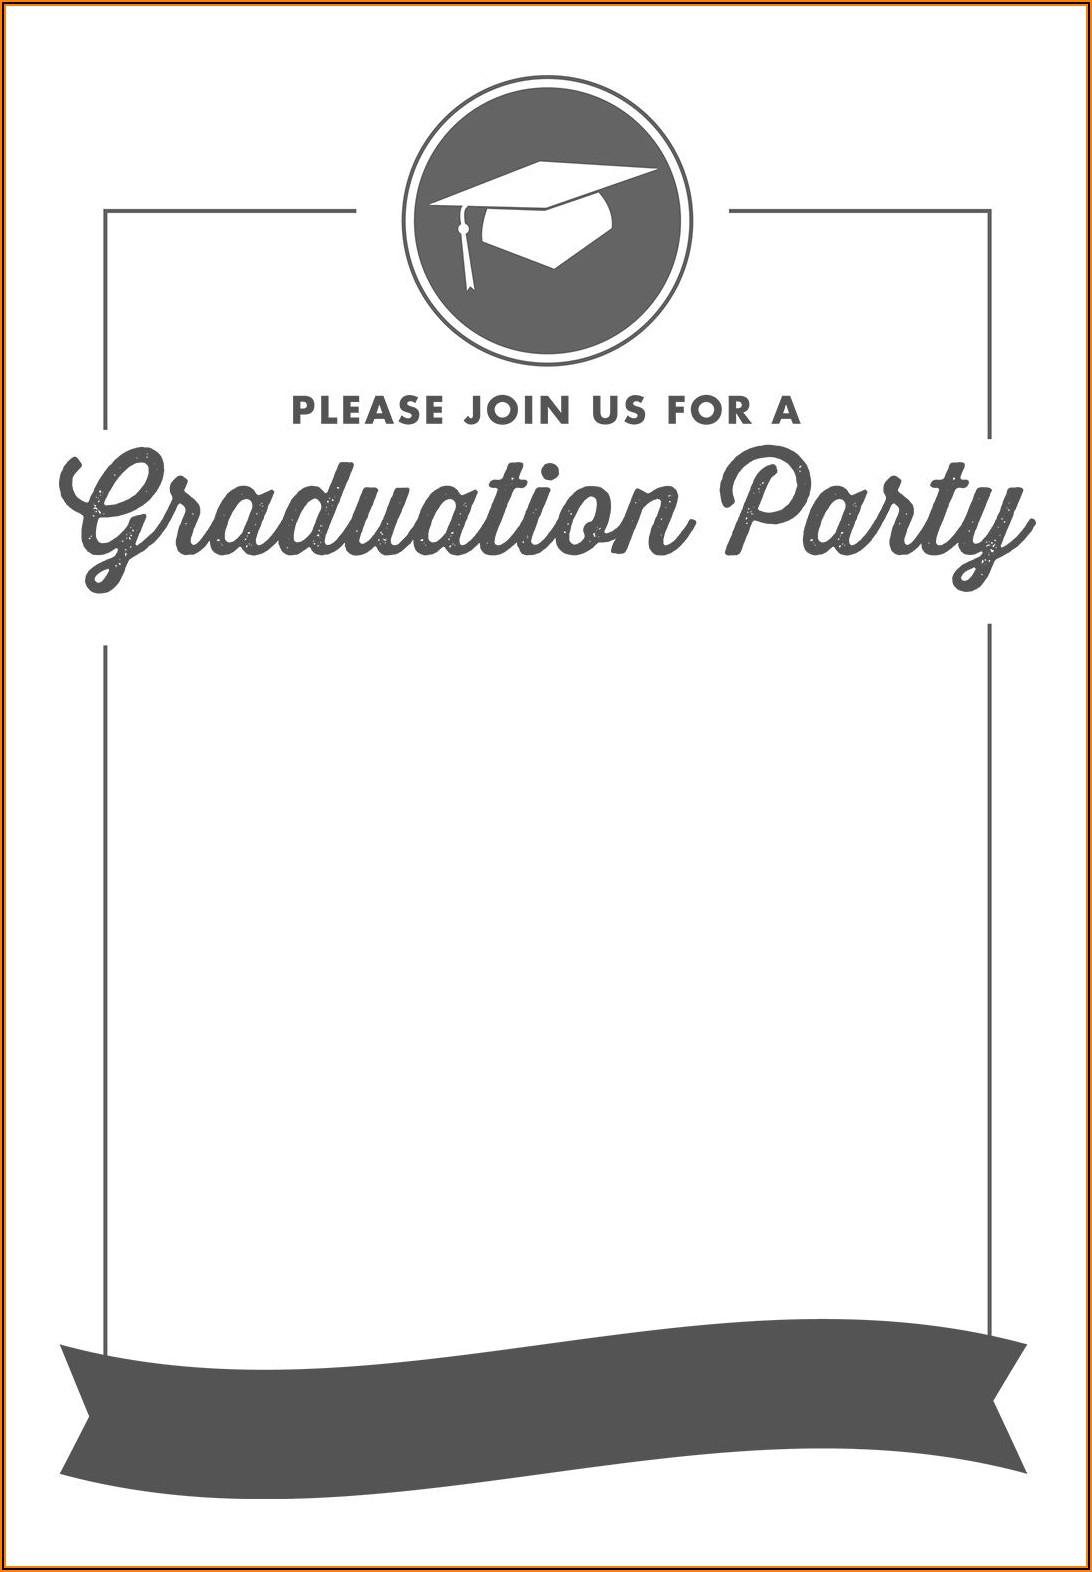 Printable Graduation Party Invitation Template